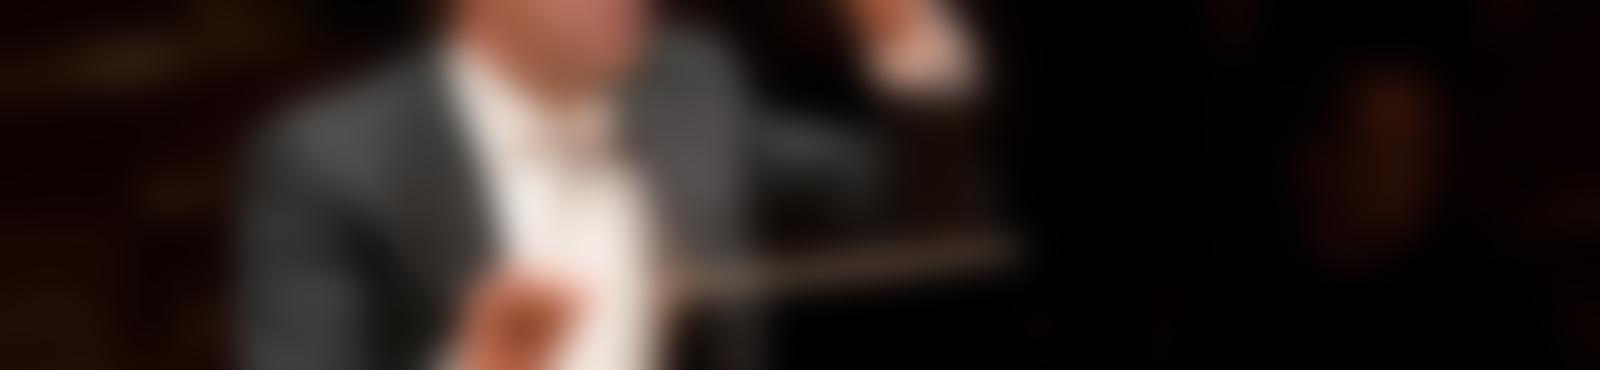 Blurred 9b95b495 8abe 4e81 8c42 bf6b2905c18a